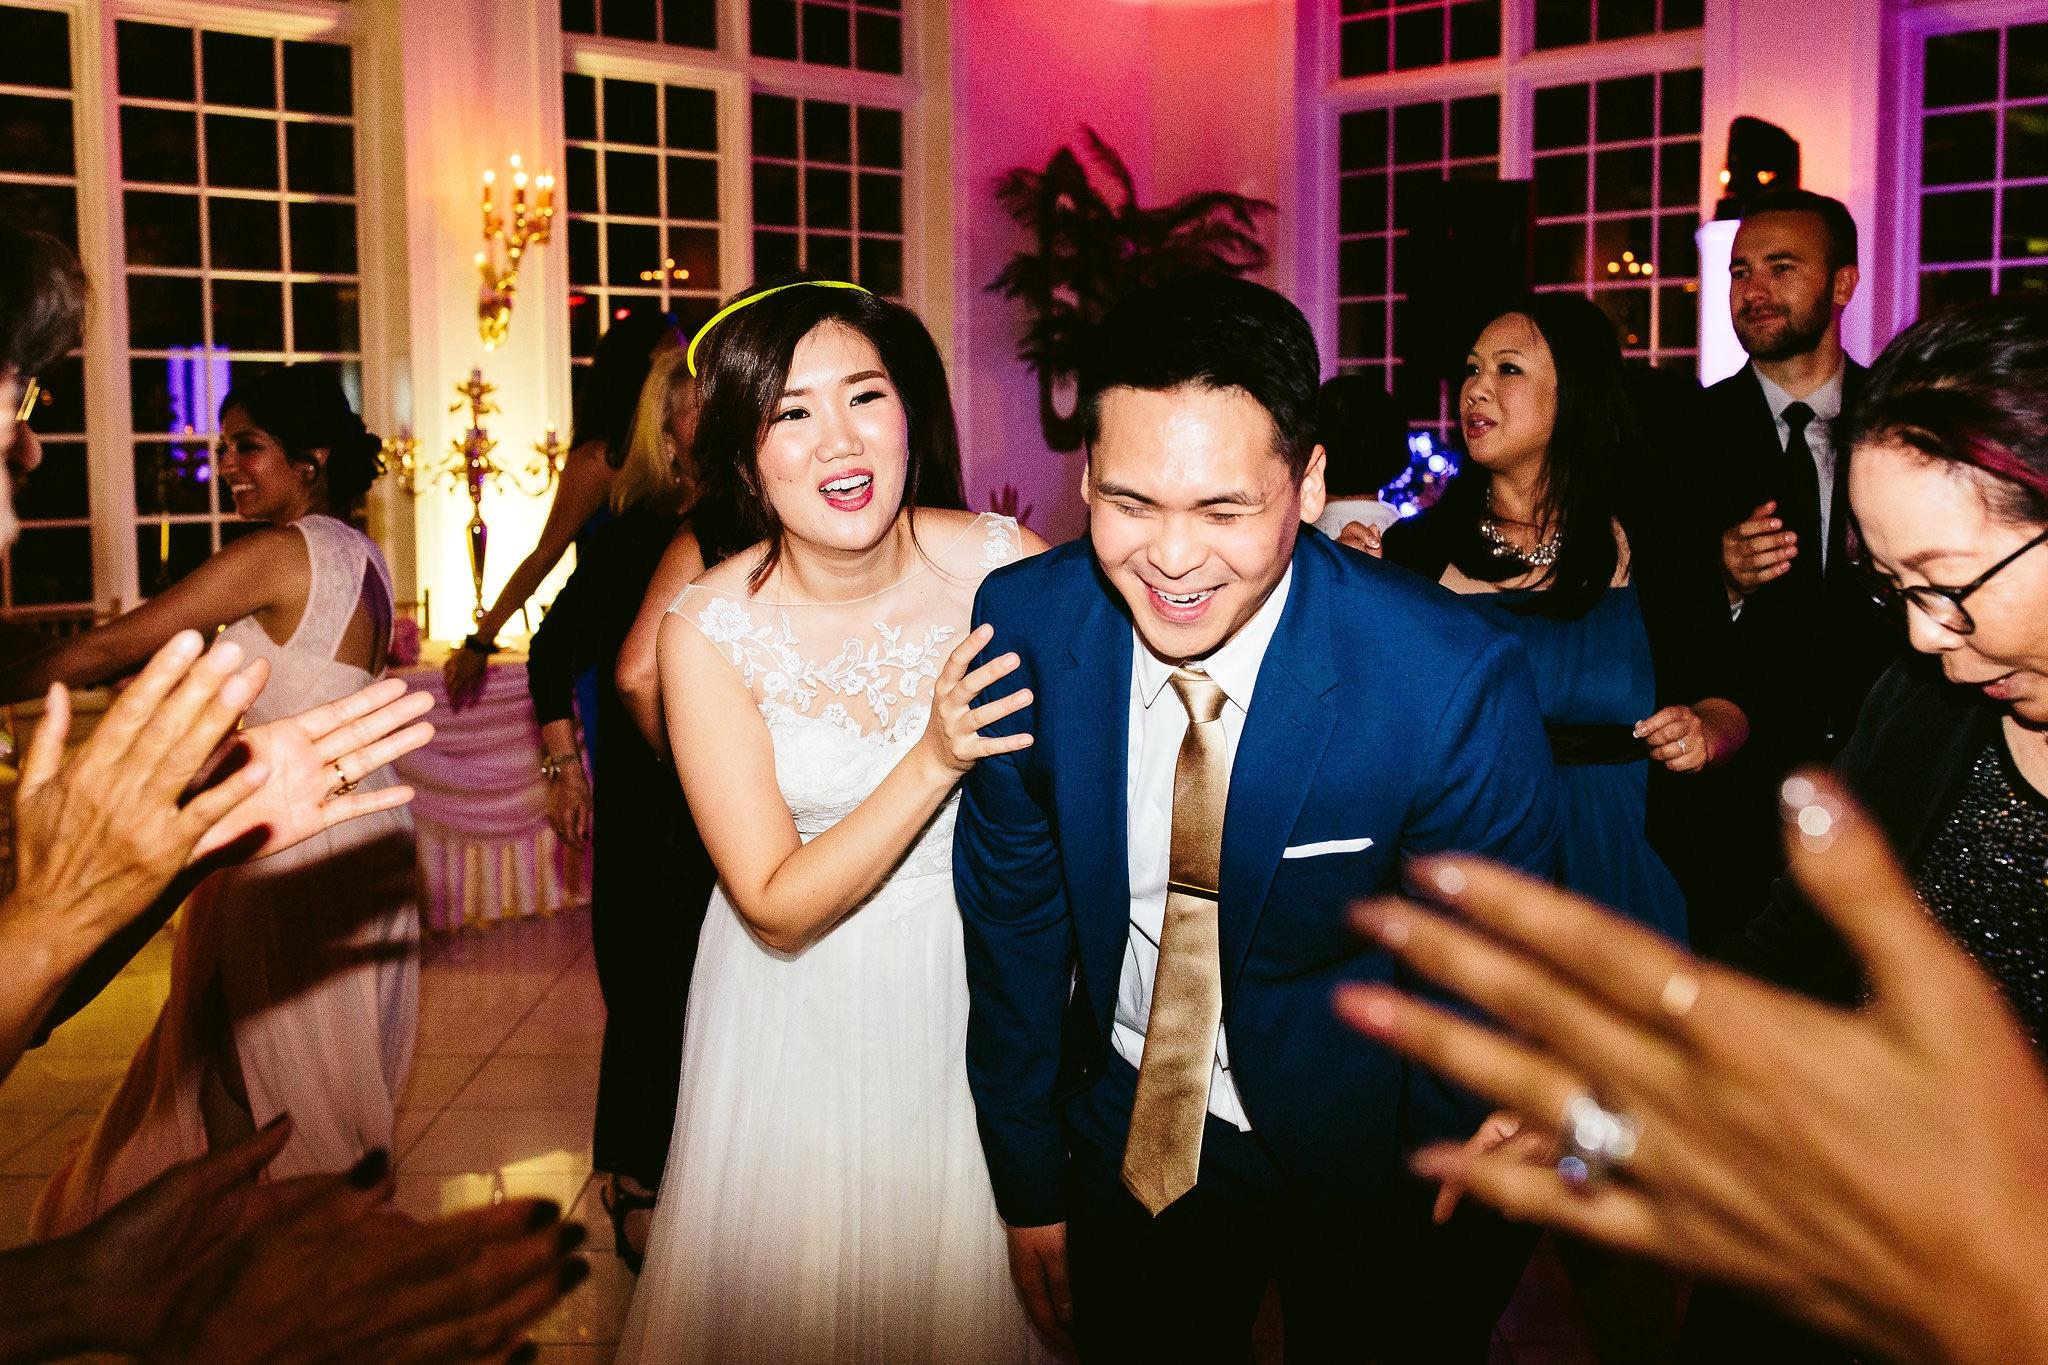 nicodem-creative-chicago-wedding-photography-inspiration-patrick-haley-mansion-elana-darrus-makeup-bridal-boutique-of-naperville